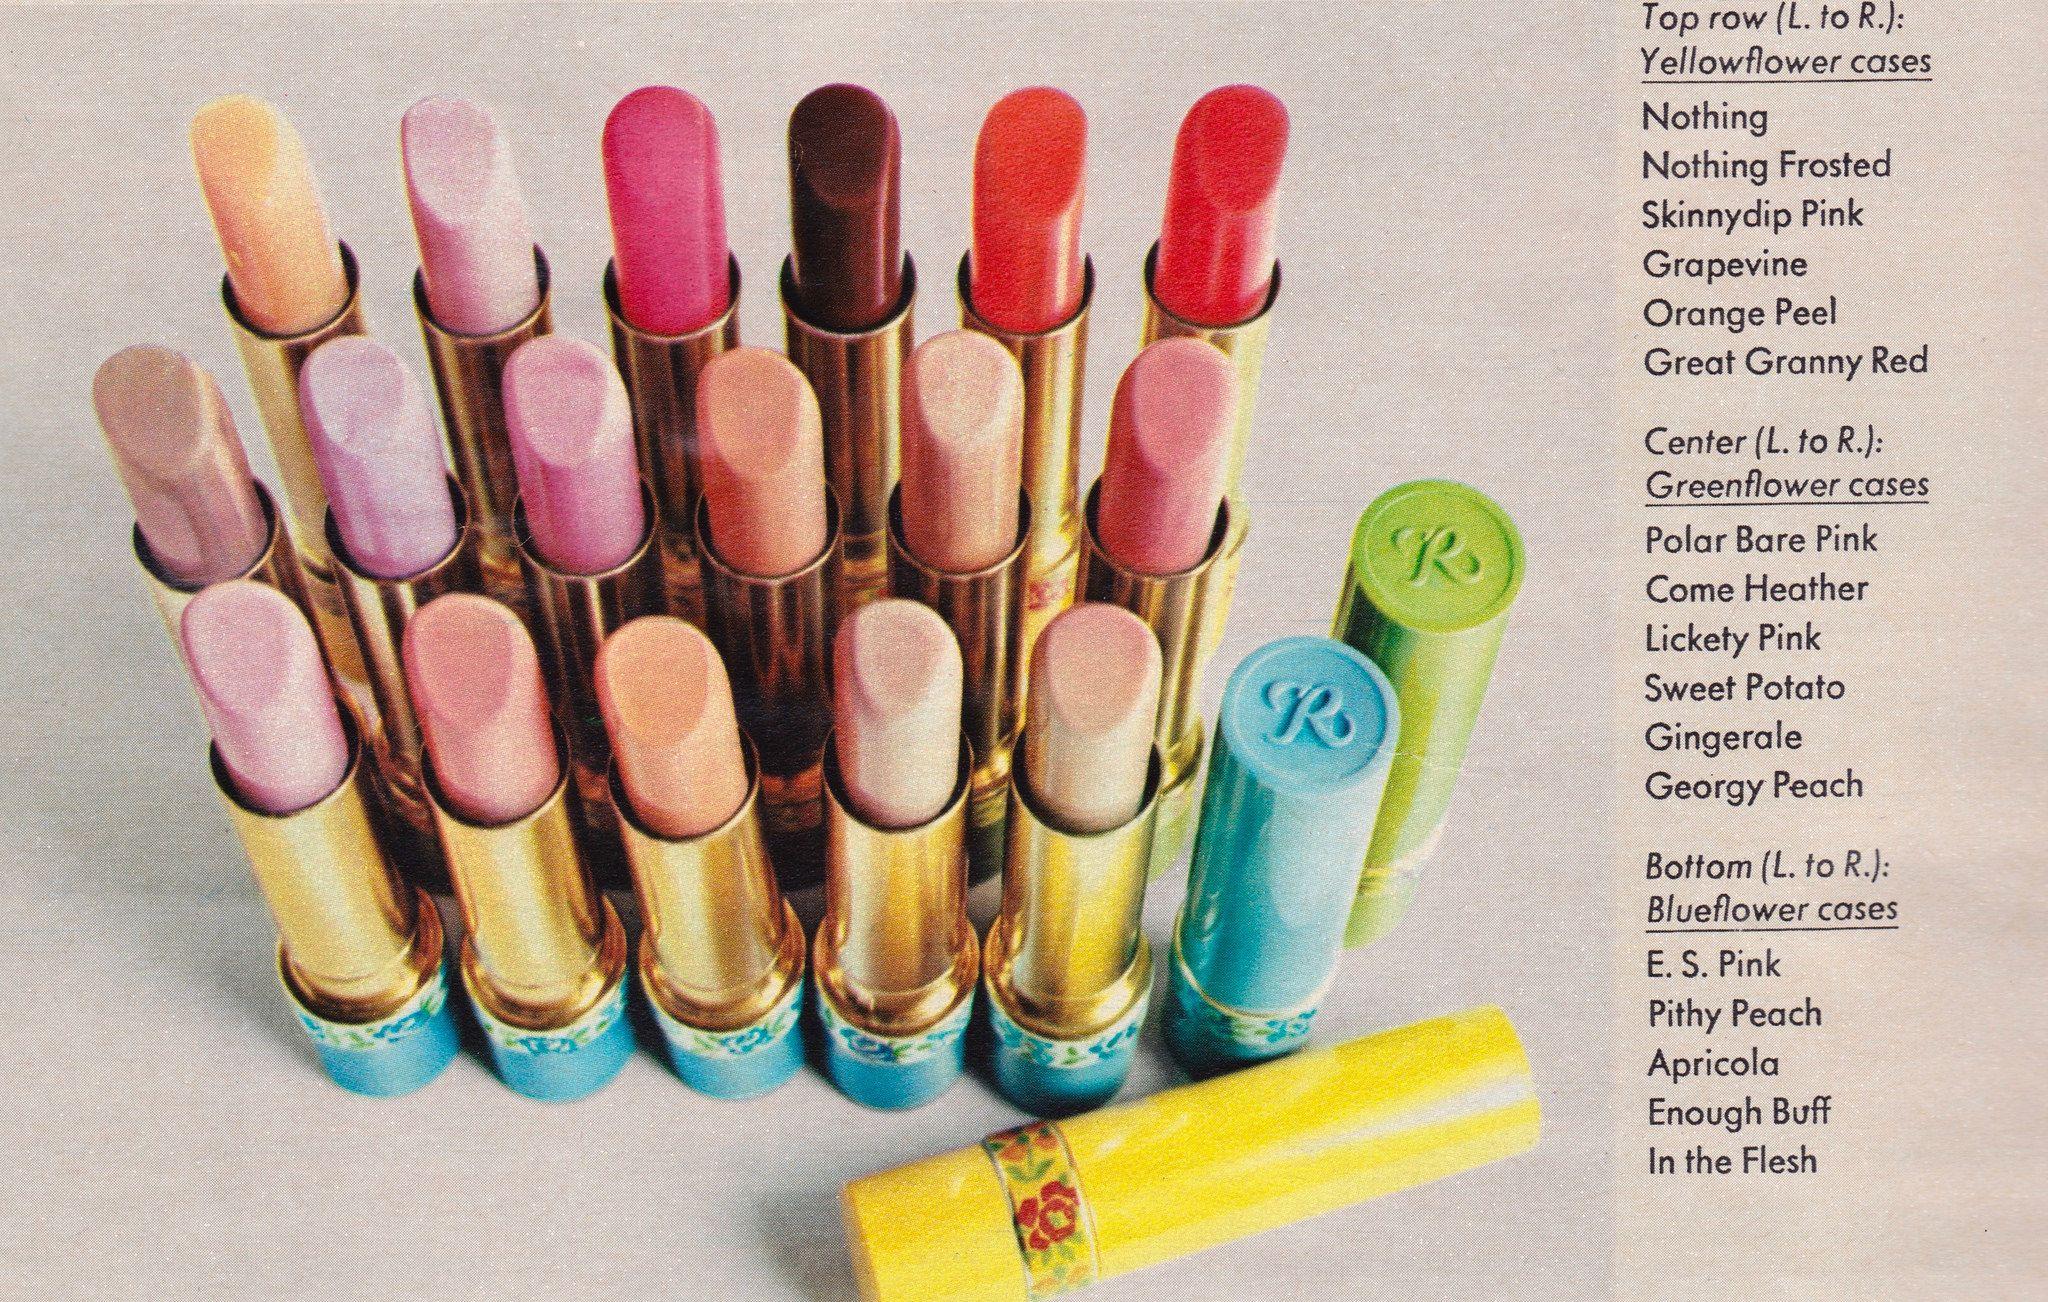 10 Best Revlon Vintage Lipsticks (And